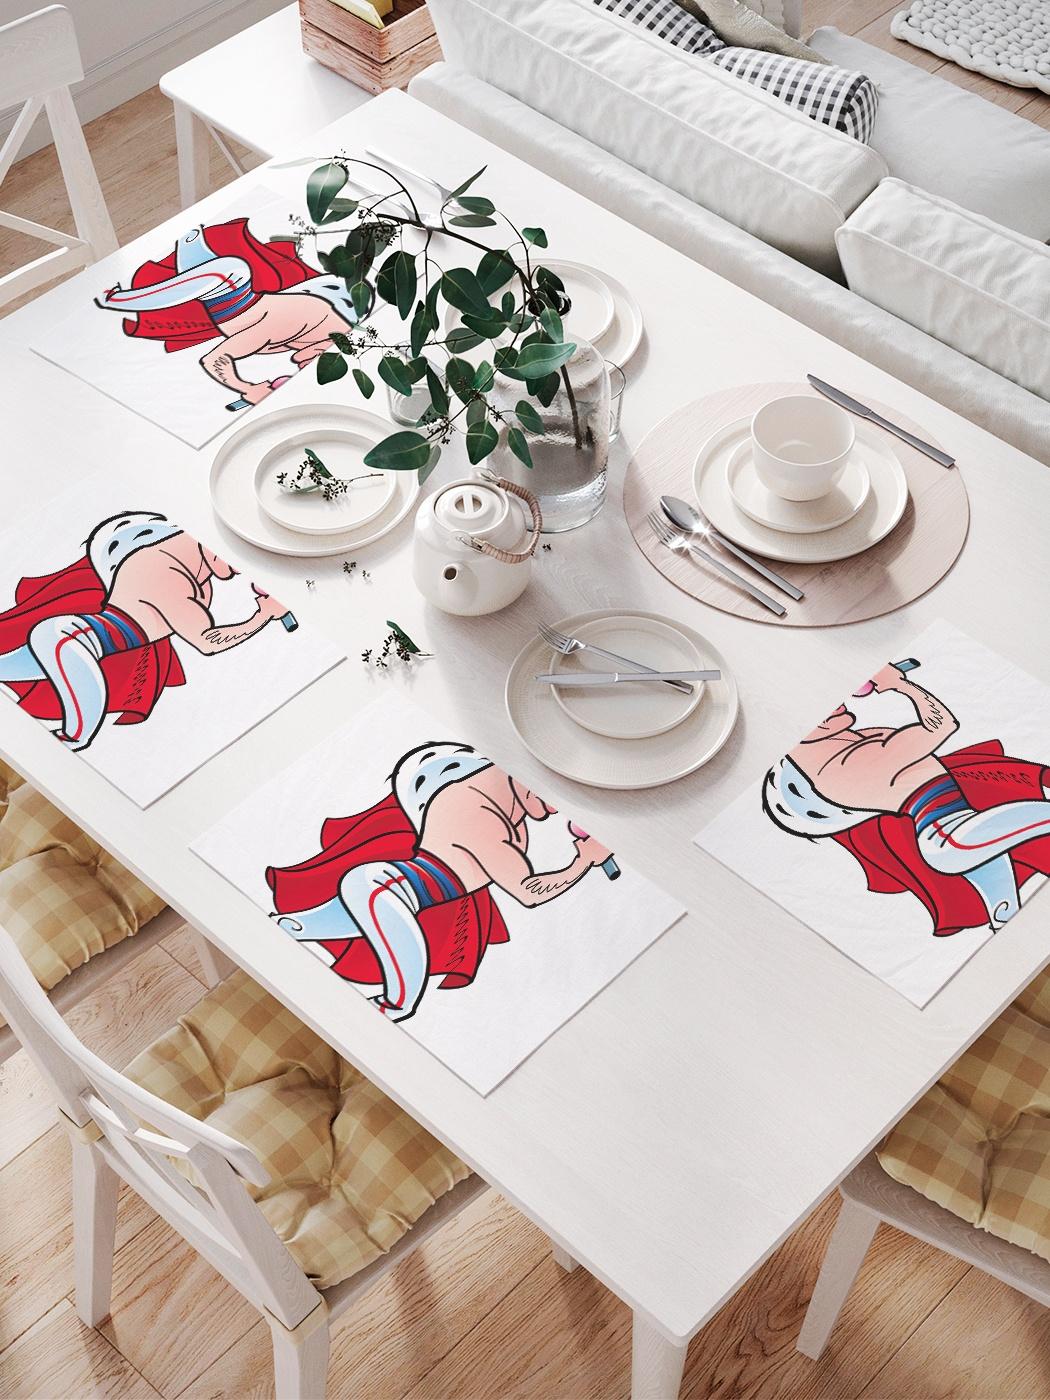 Комплект салфеток для сервировки стола «Фредди Меркьюри» (32х46 см, 4 шт.)